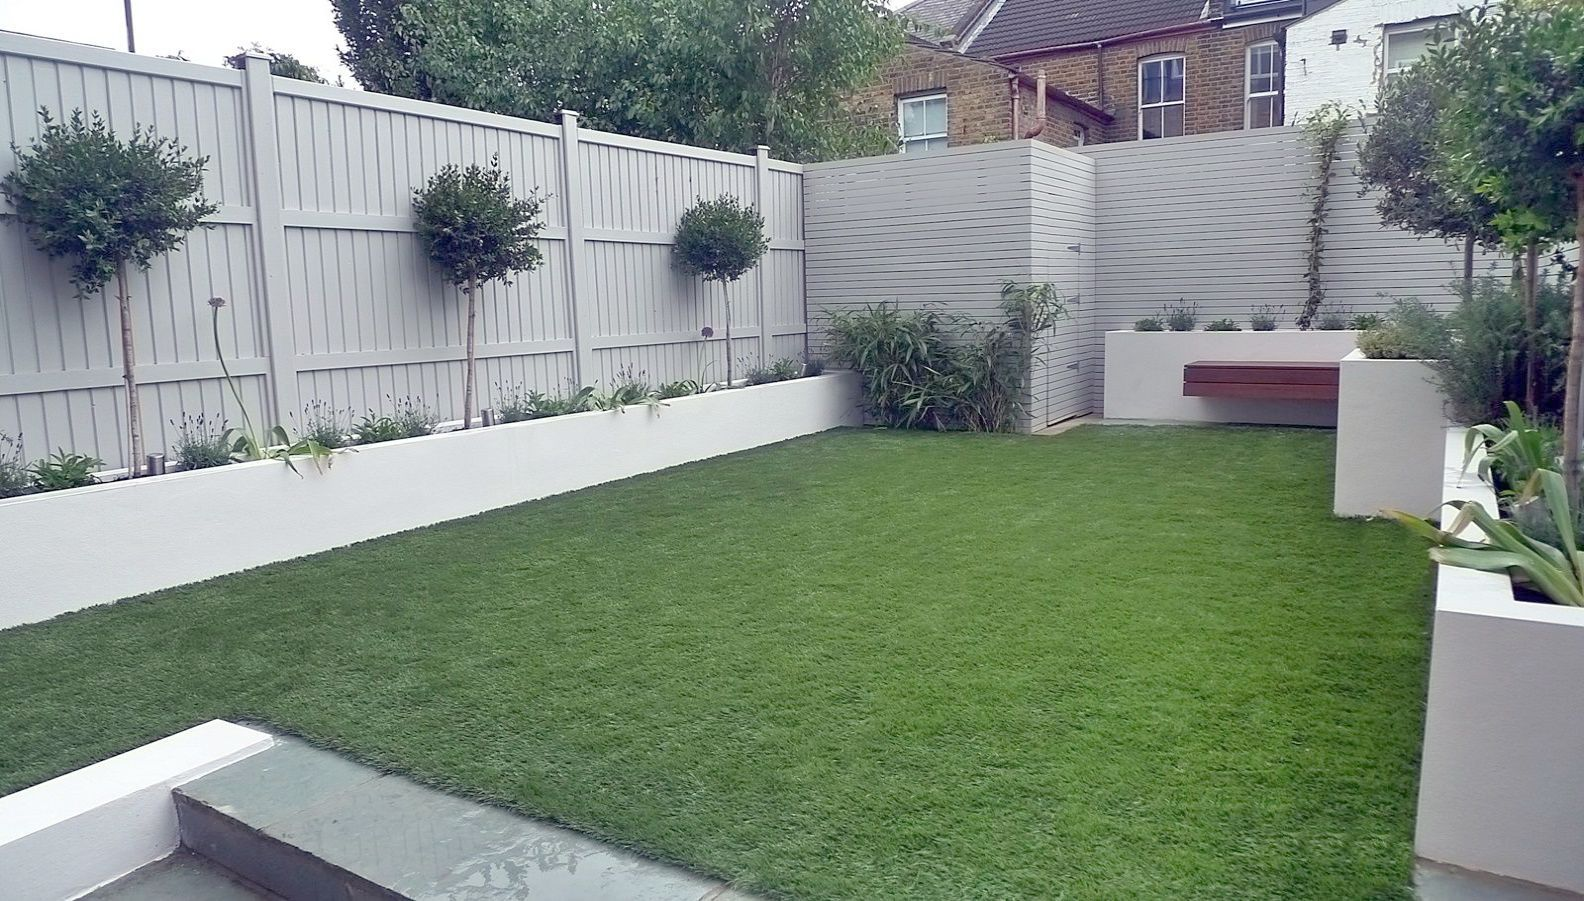 Green More Landscape Gardening Llc Around Landscape Gardening Courses Stockport Around Best Ch Garden Design Ideas Uk Modern Garden Design Garden Fence Paint